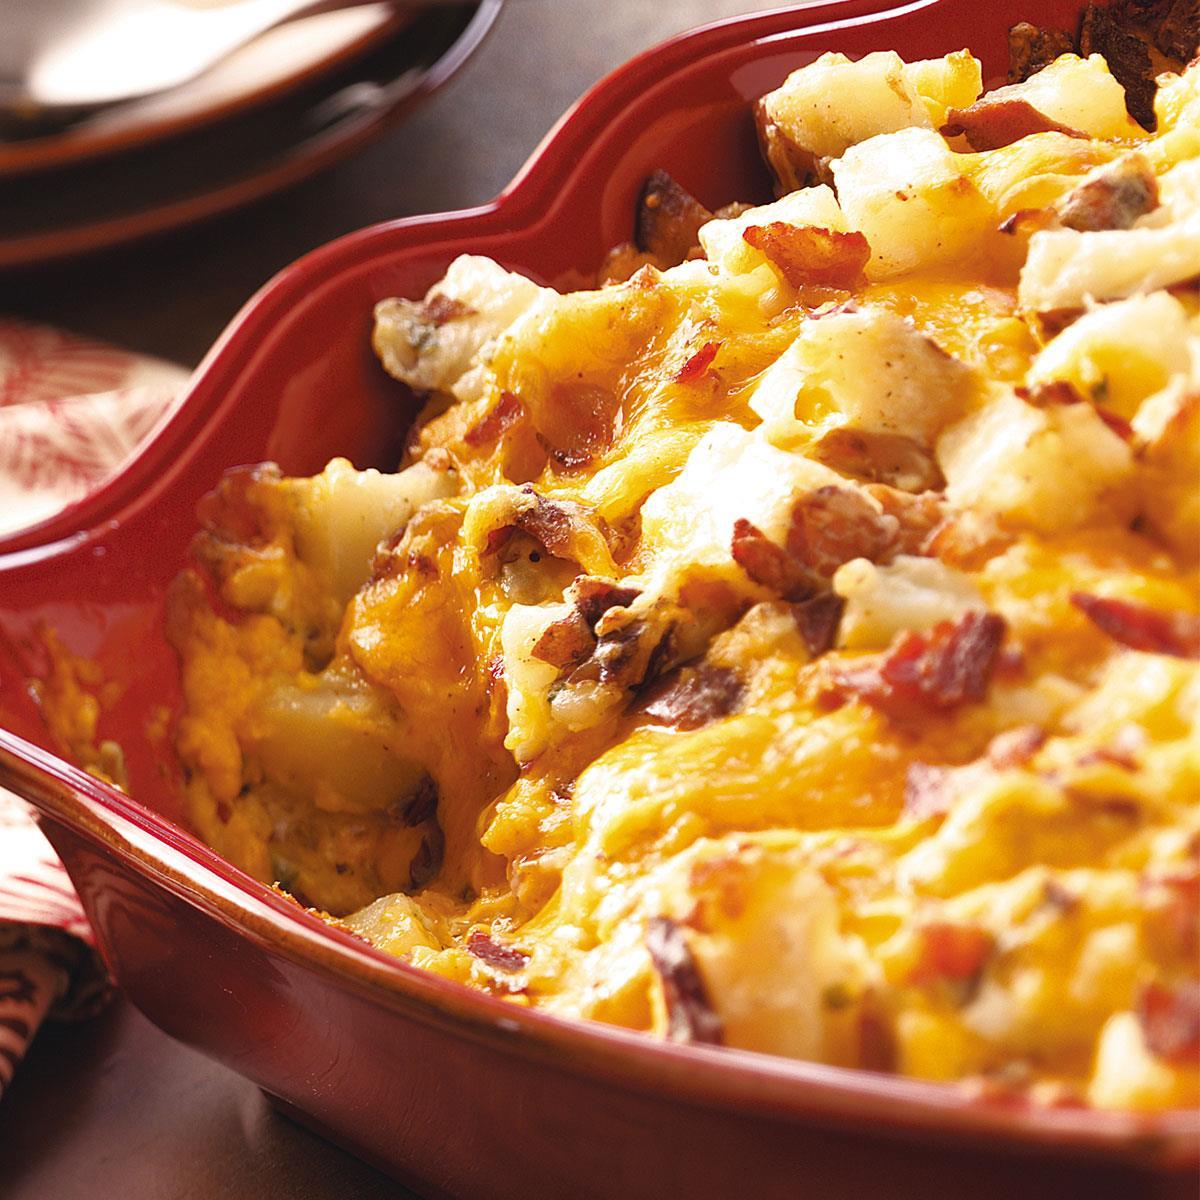 Casseroles Recipes: Baked Potato Casserole Recipe